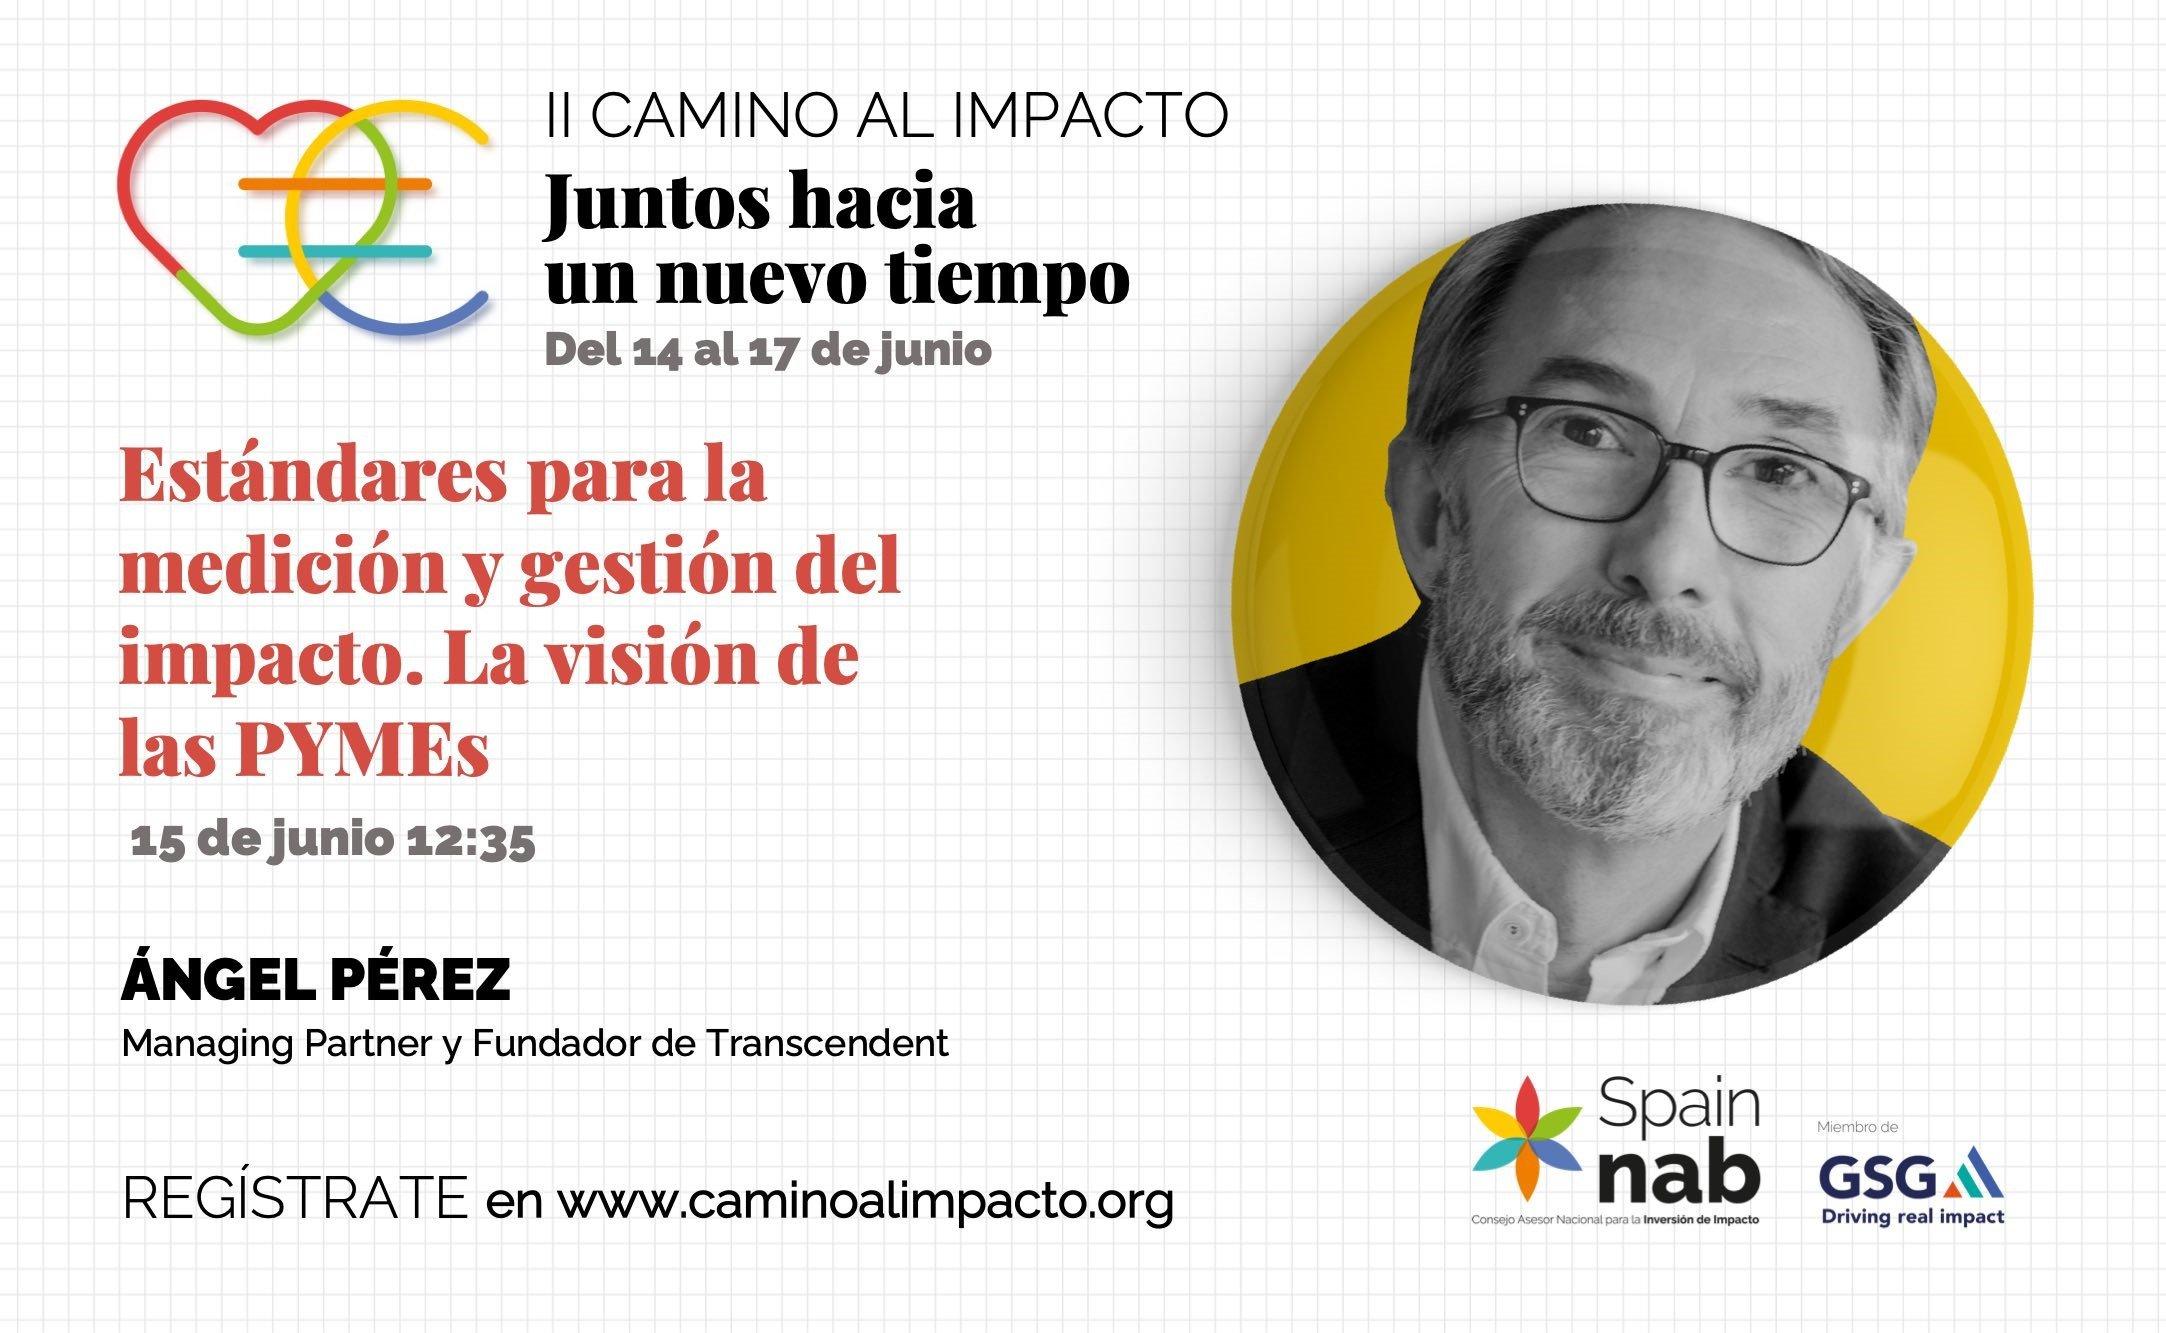 Camino al Impacto- Angel Perez Agenjo